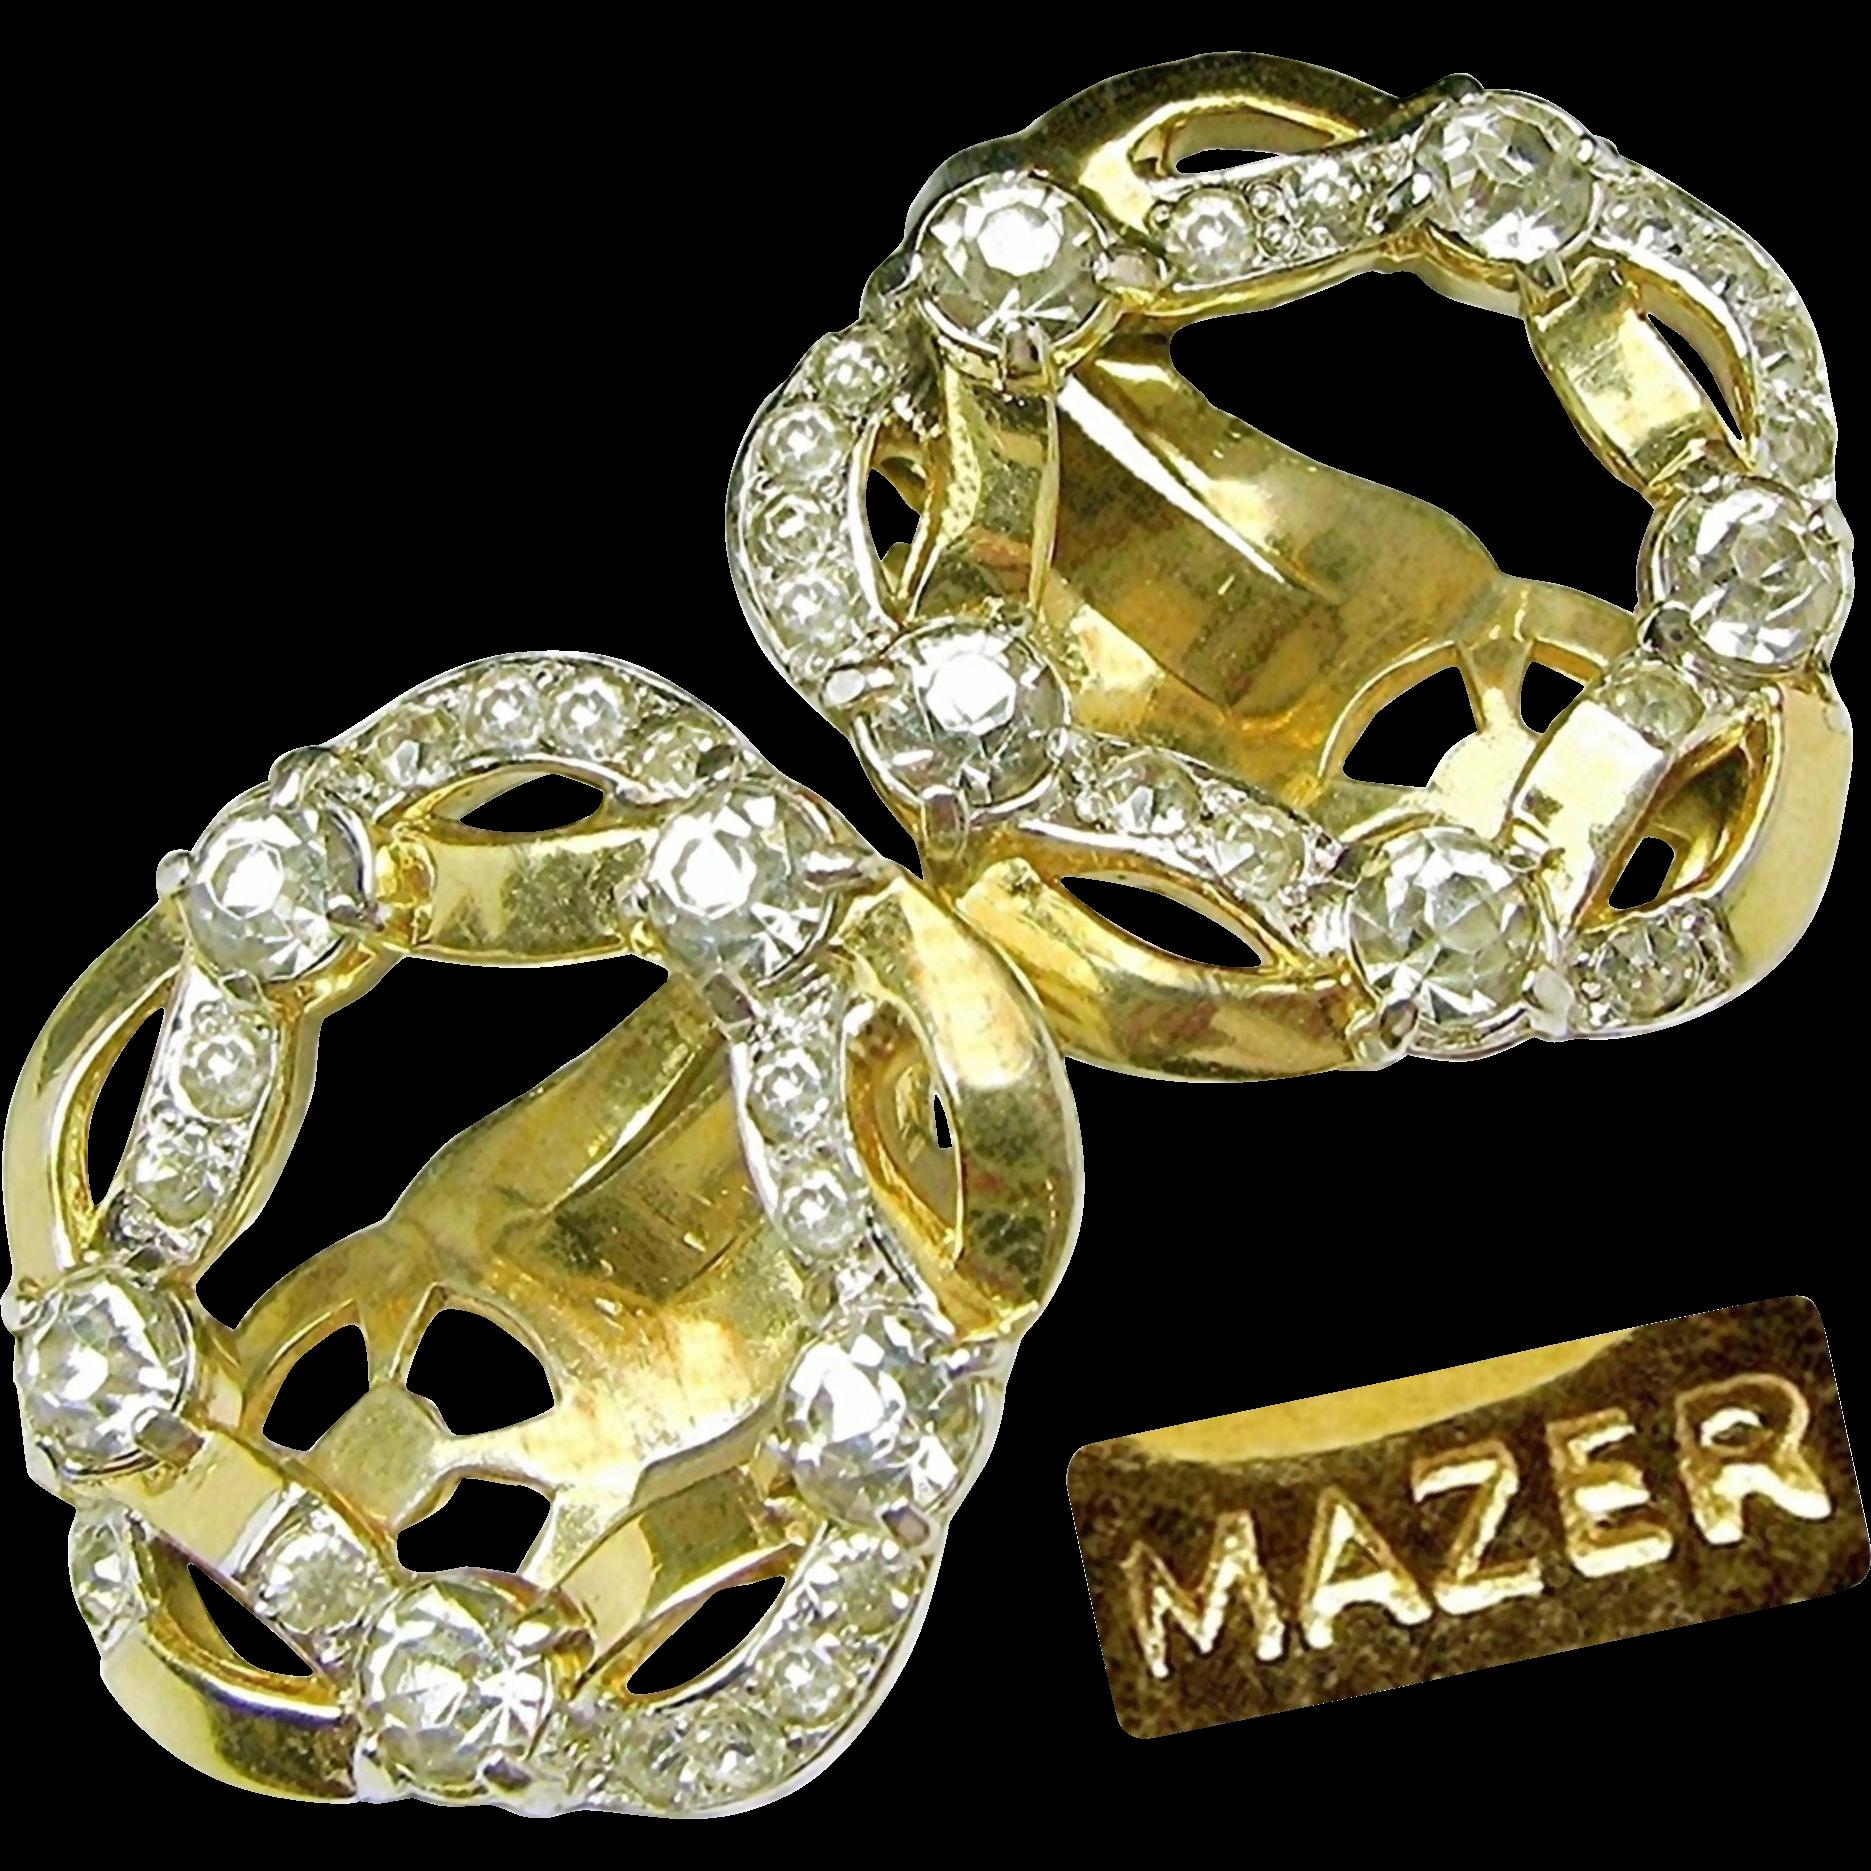 Vintage MAZER Golden Ribbon Wreath Earrings Strewn w/ 'Diamond' Like Rhinestones c.1950's